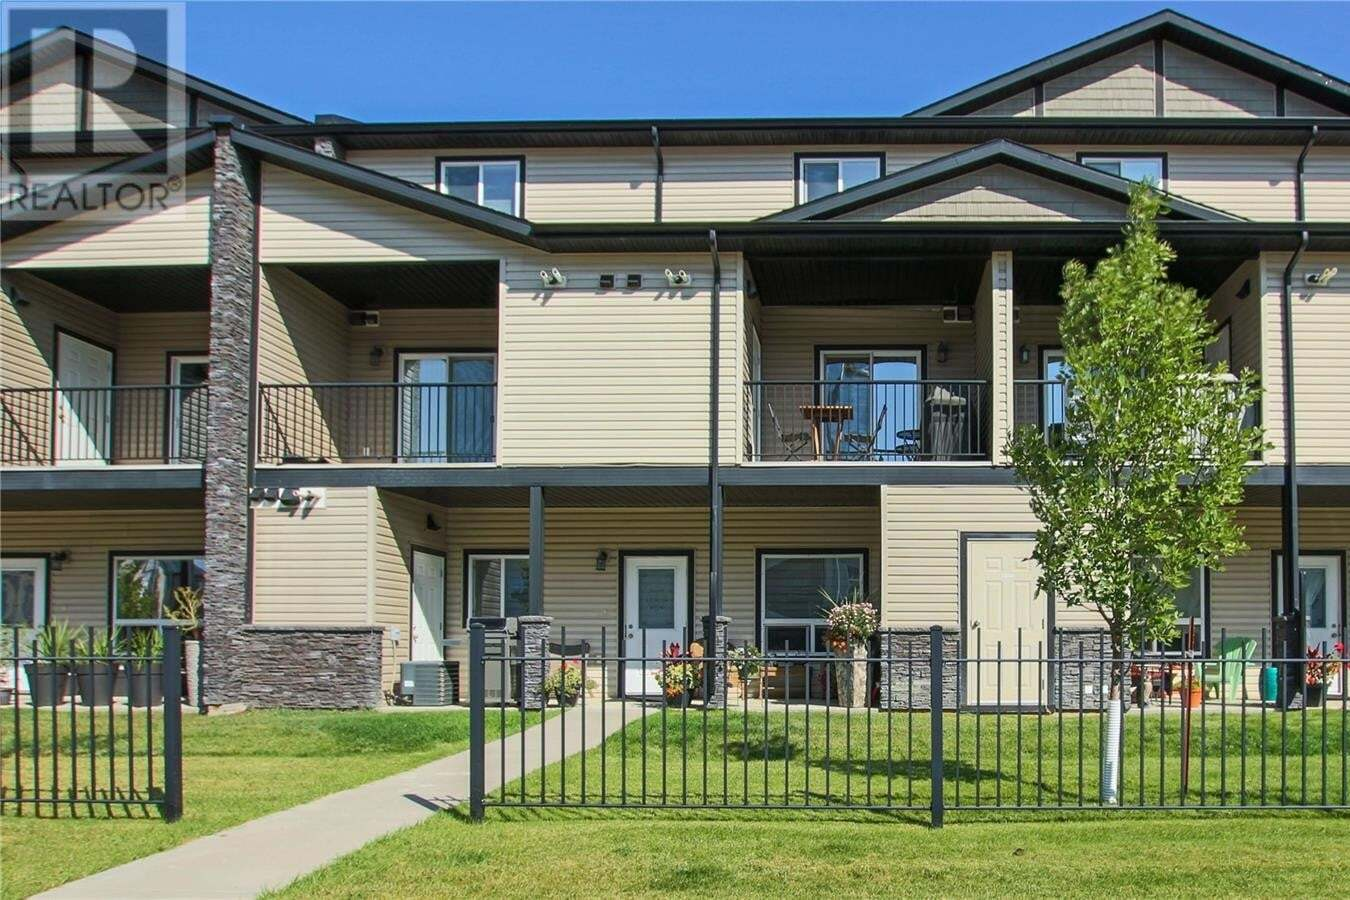 Townhouse for sale at 3810 Dewdney Ave E Unit 108 Regina Saskatchewan - MLS: SK827585